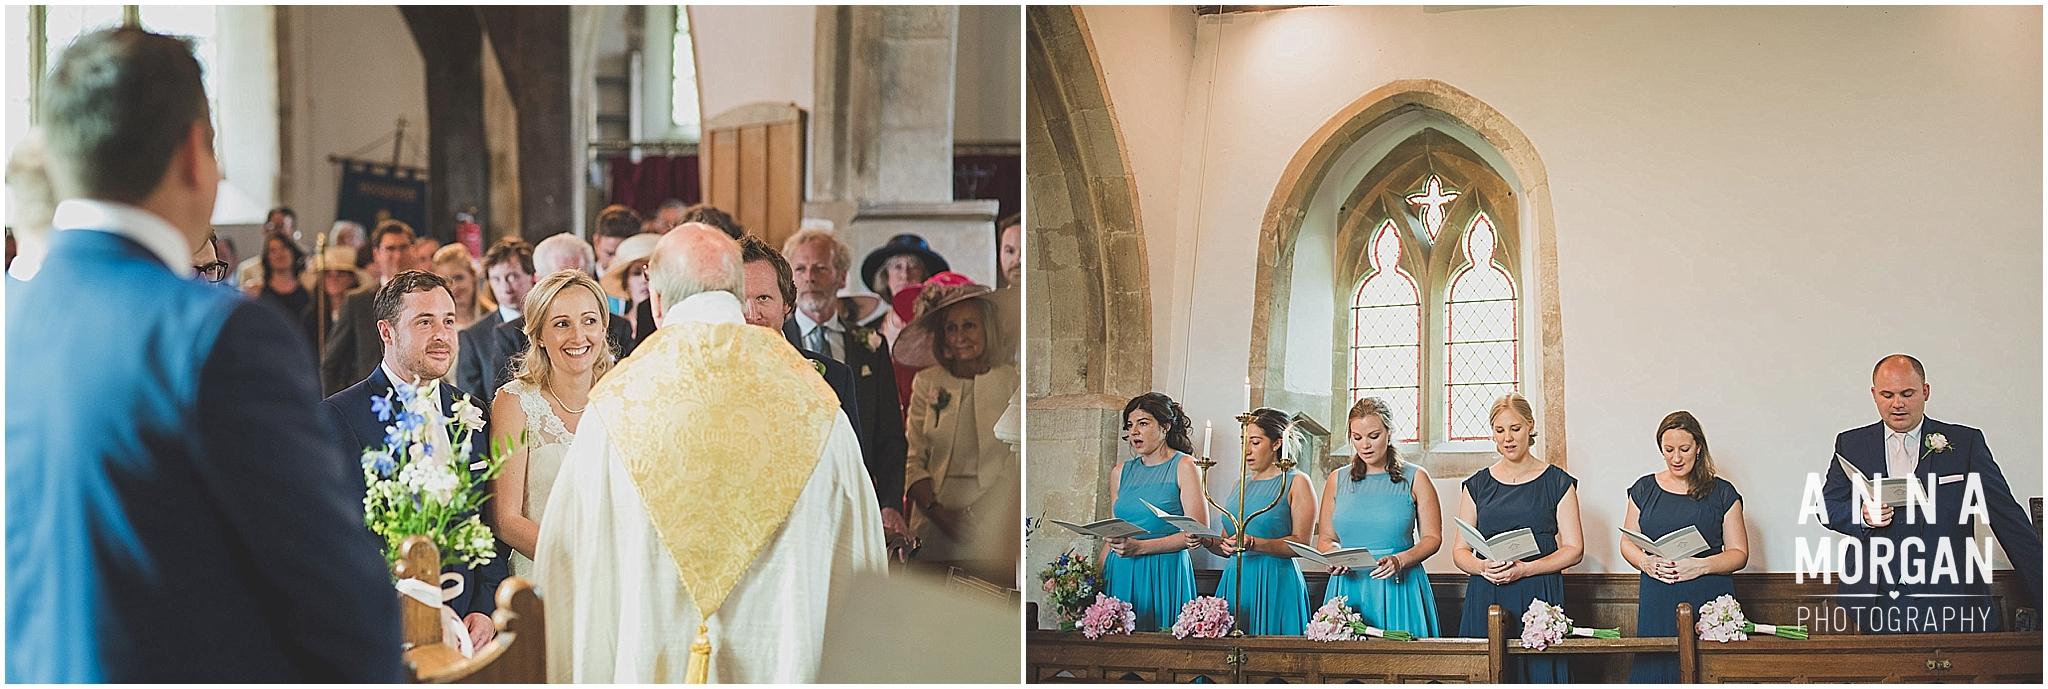 Horsebridge Station Wedding Becky & Freddie Anna Morgan Photography-12